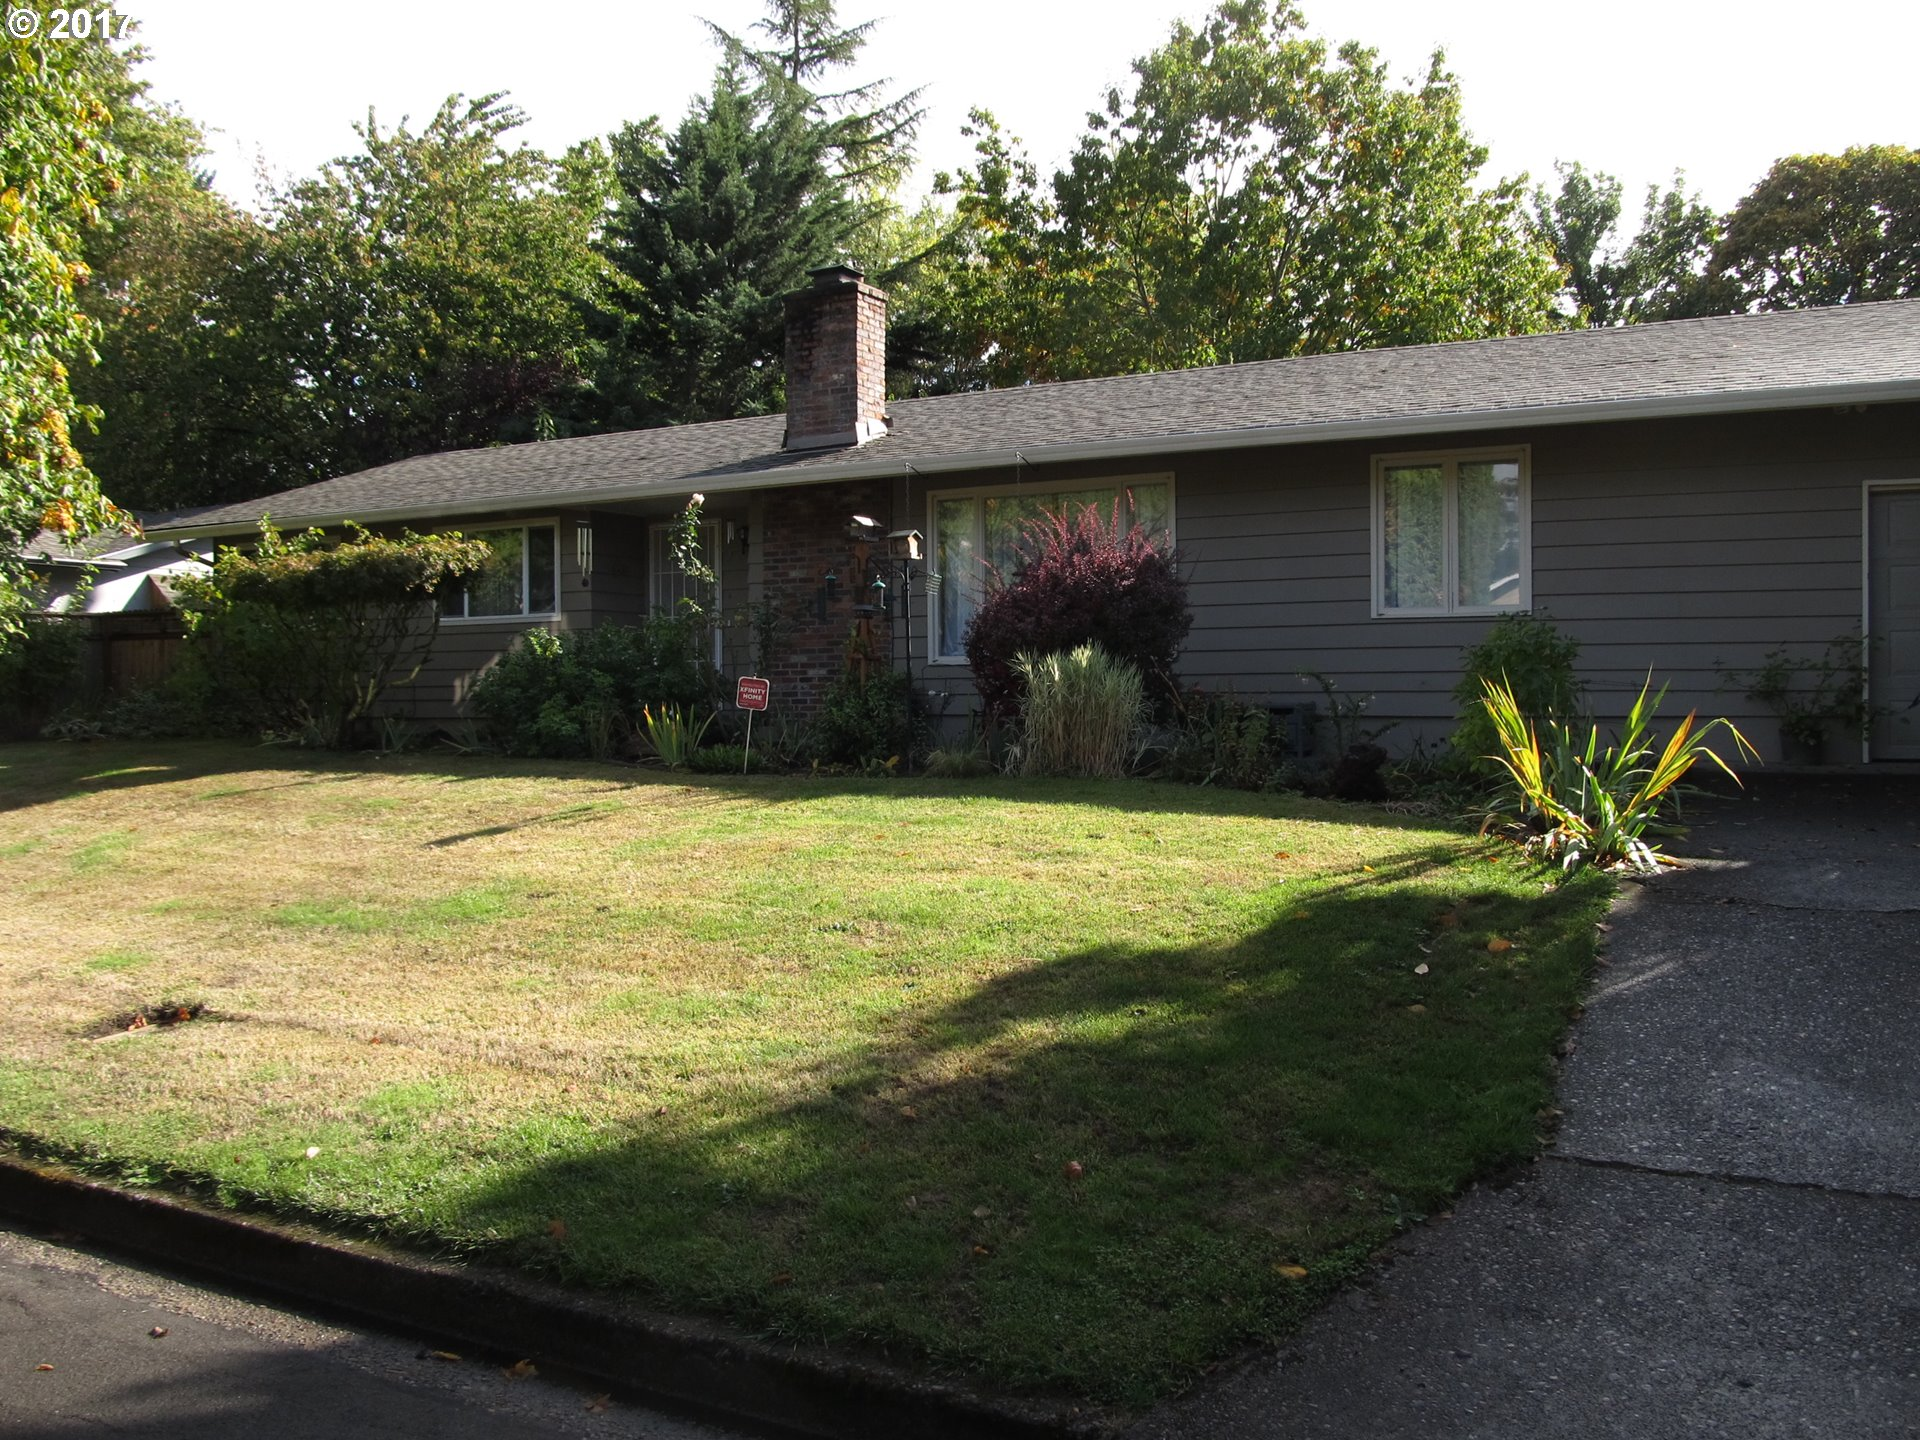 1400 HOLLY AVE, Eugene OR 97408